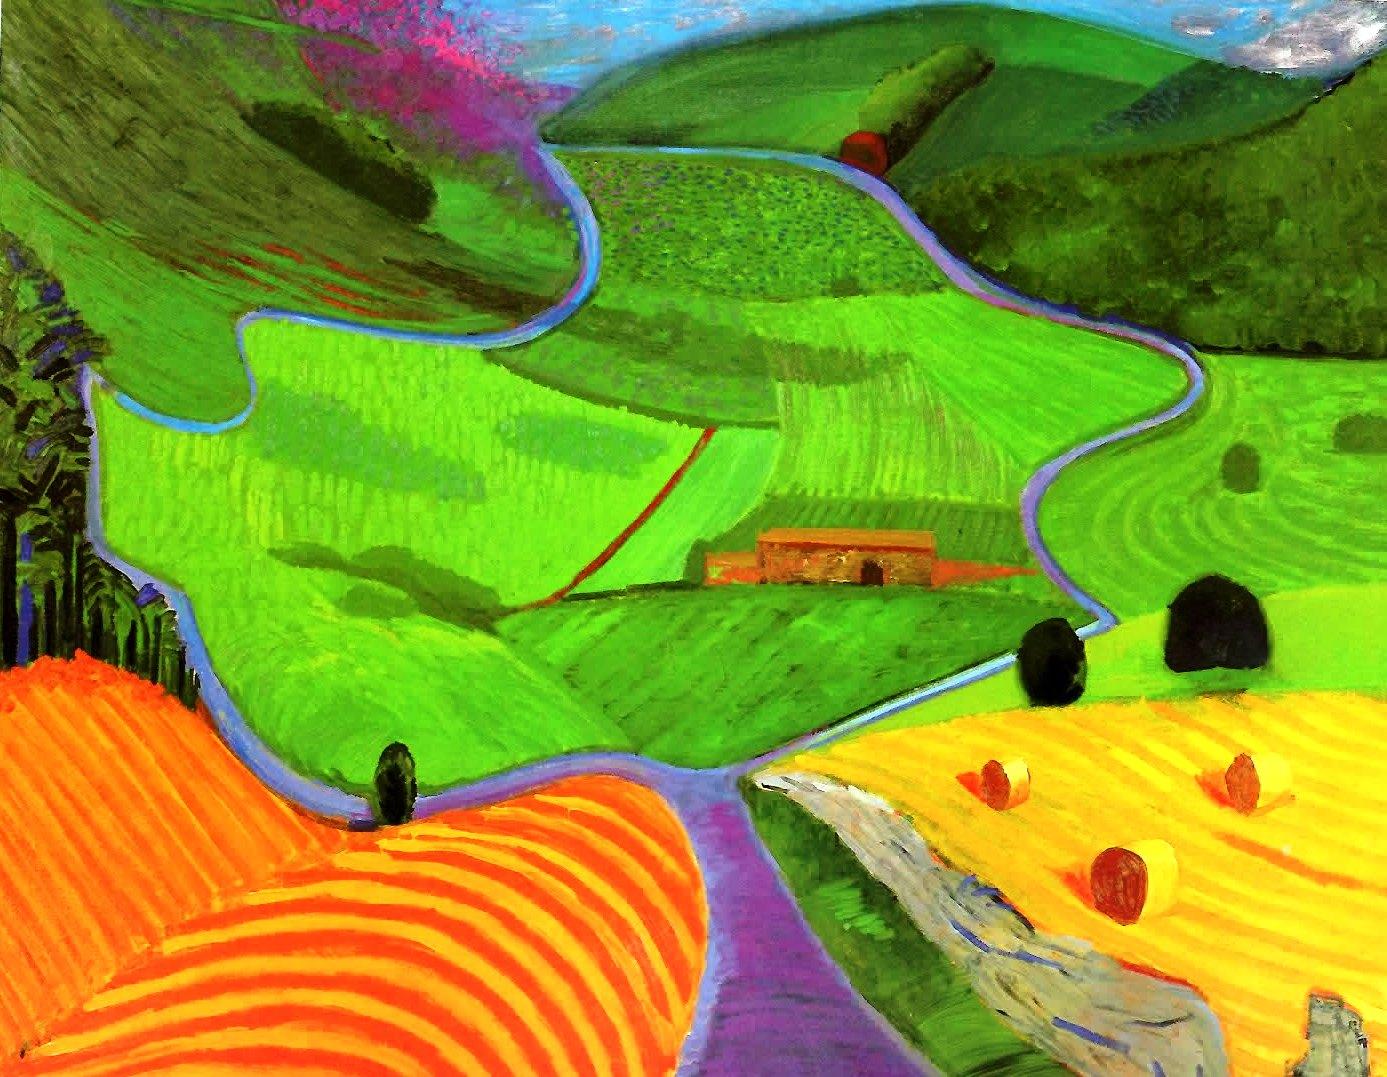 1000 images about david hockney on pinterest david for David hockney painting